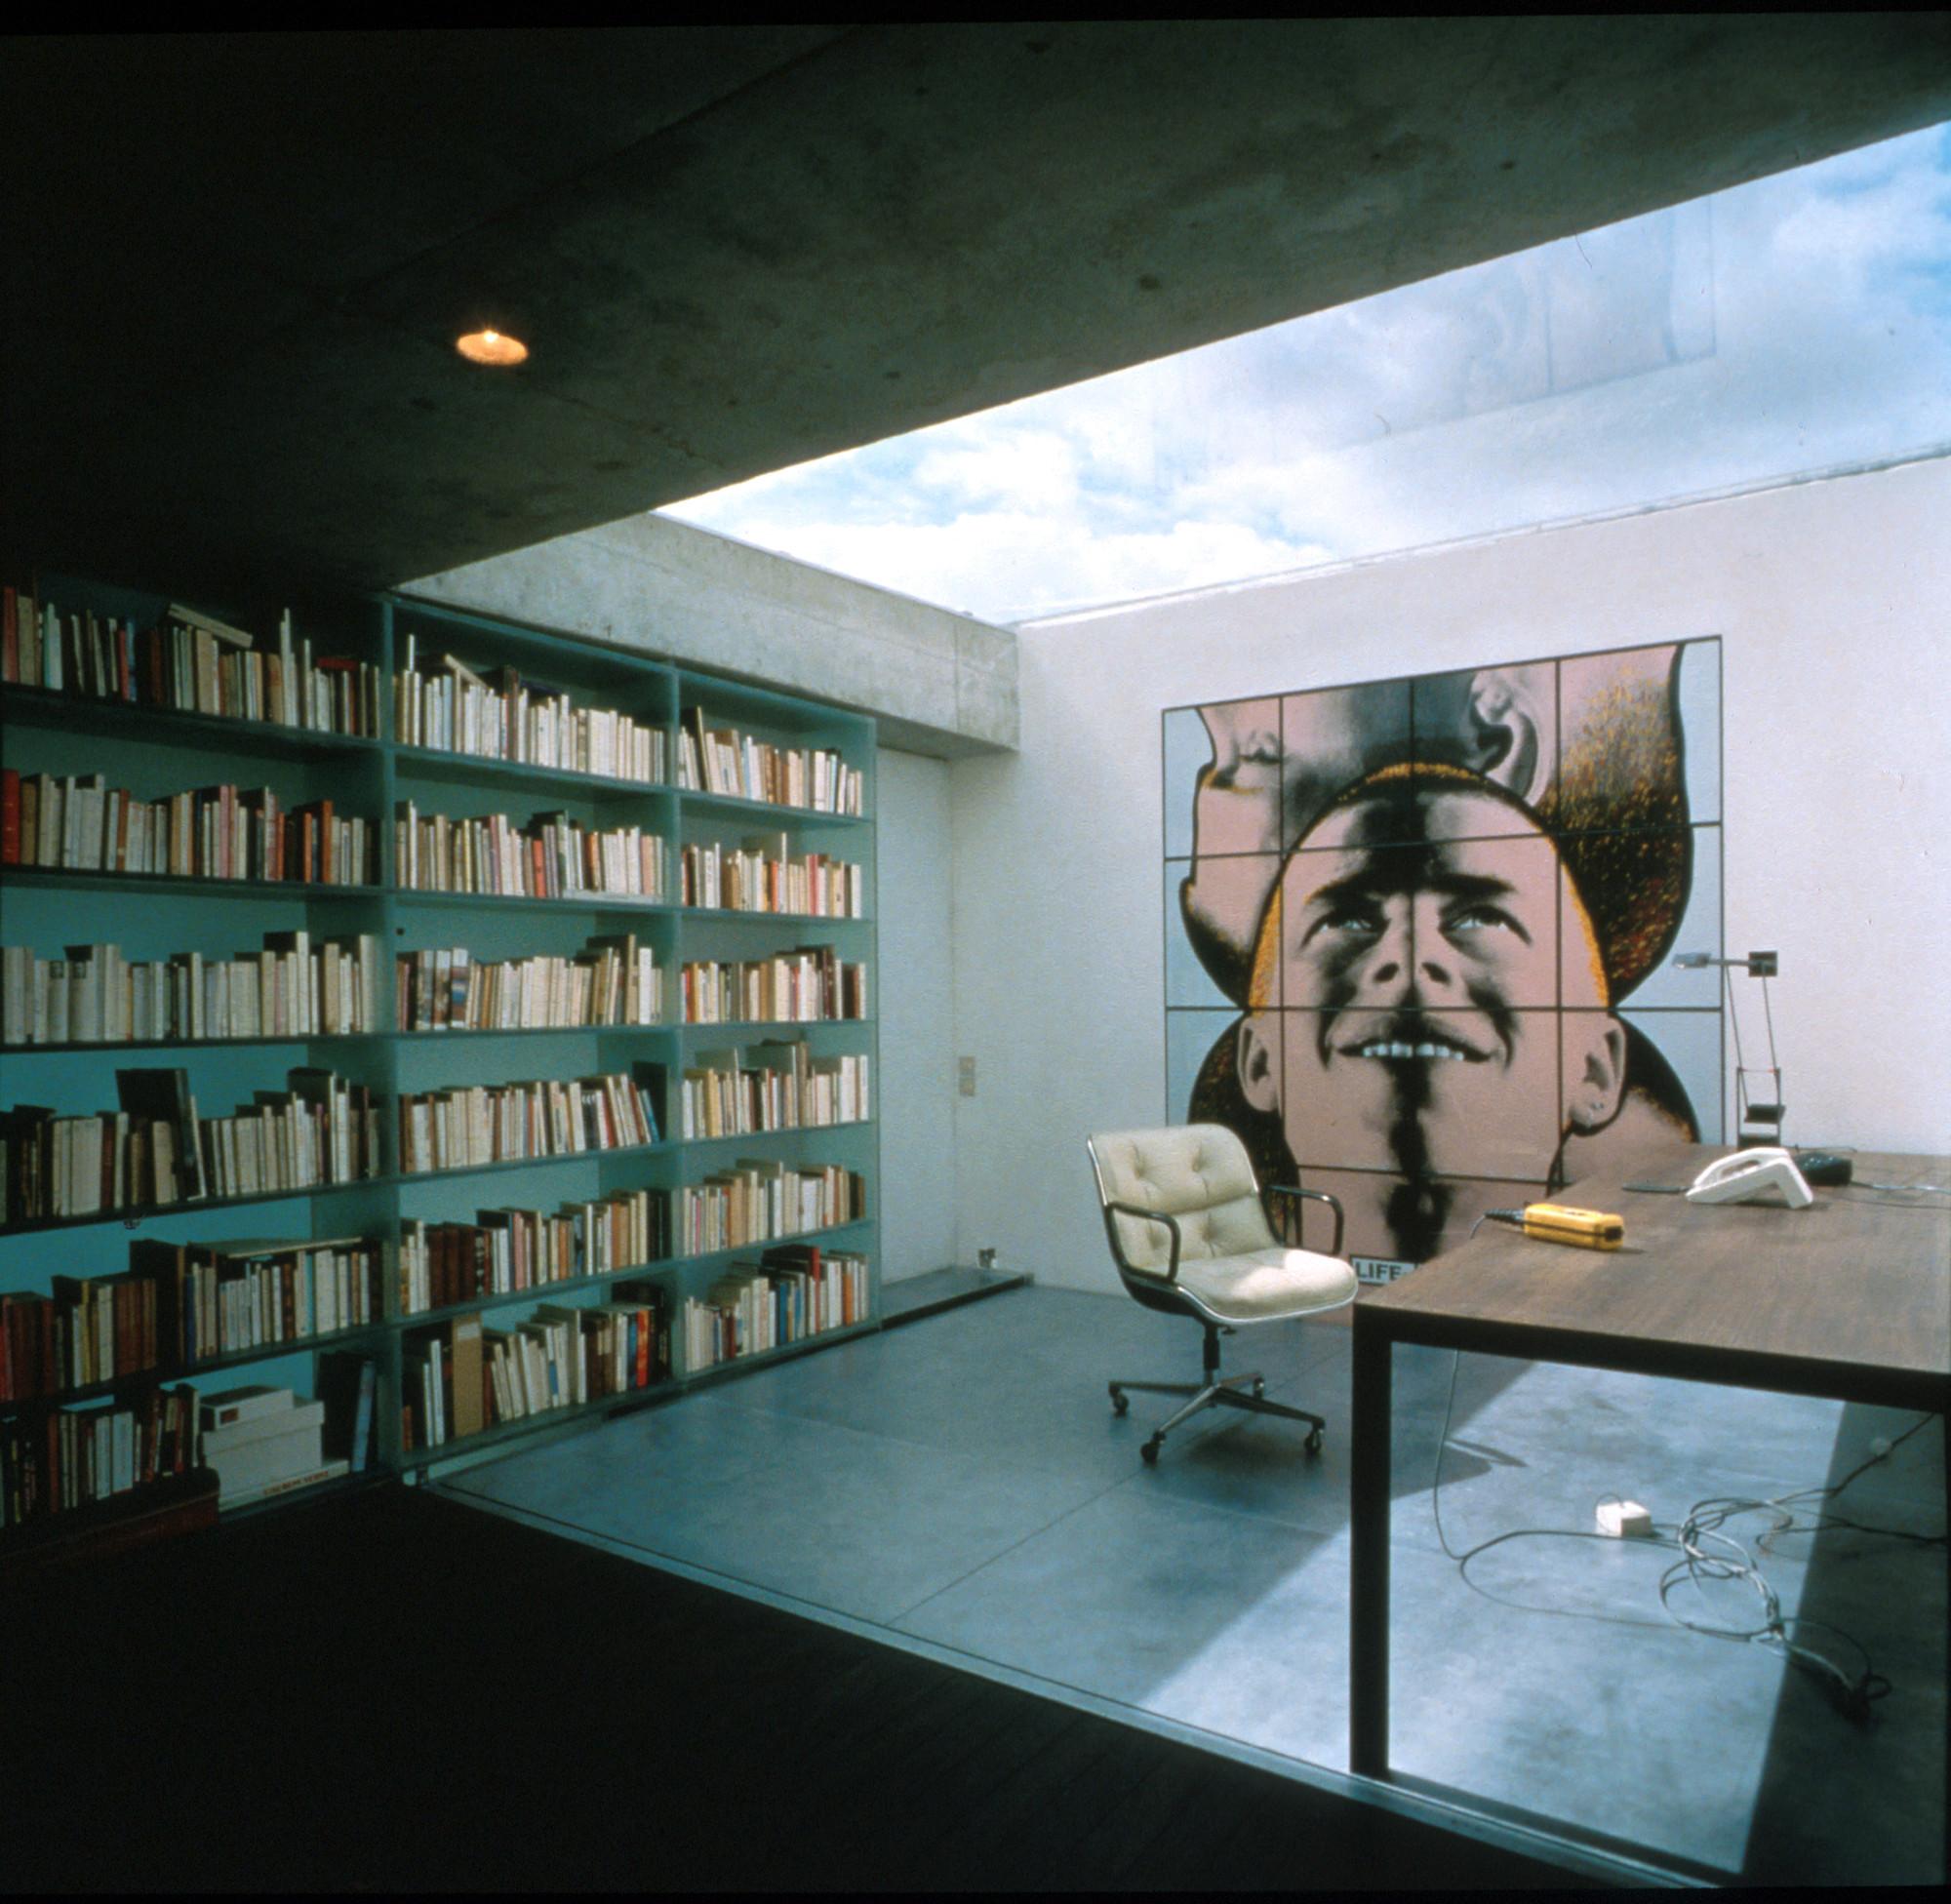 Gallery of ad classics maison bordeaux oma 5 for Maison bordeaux